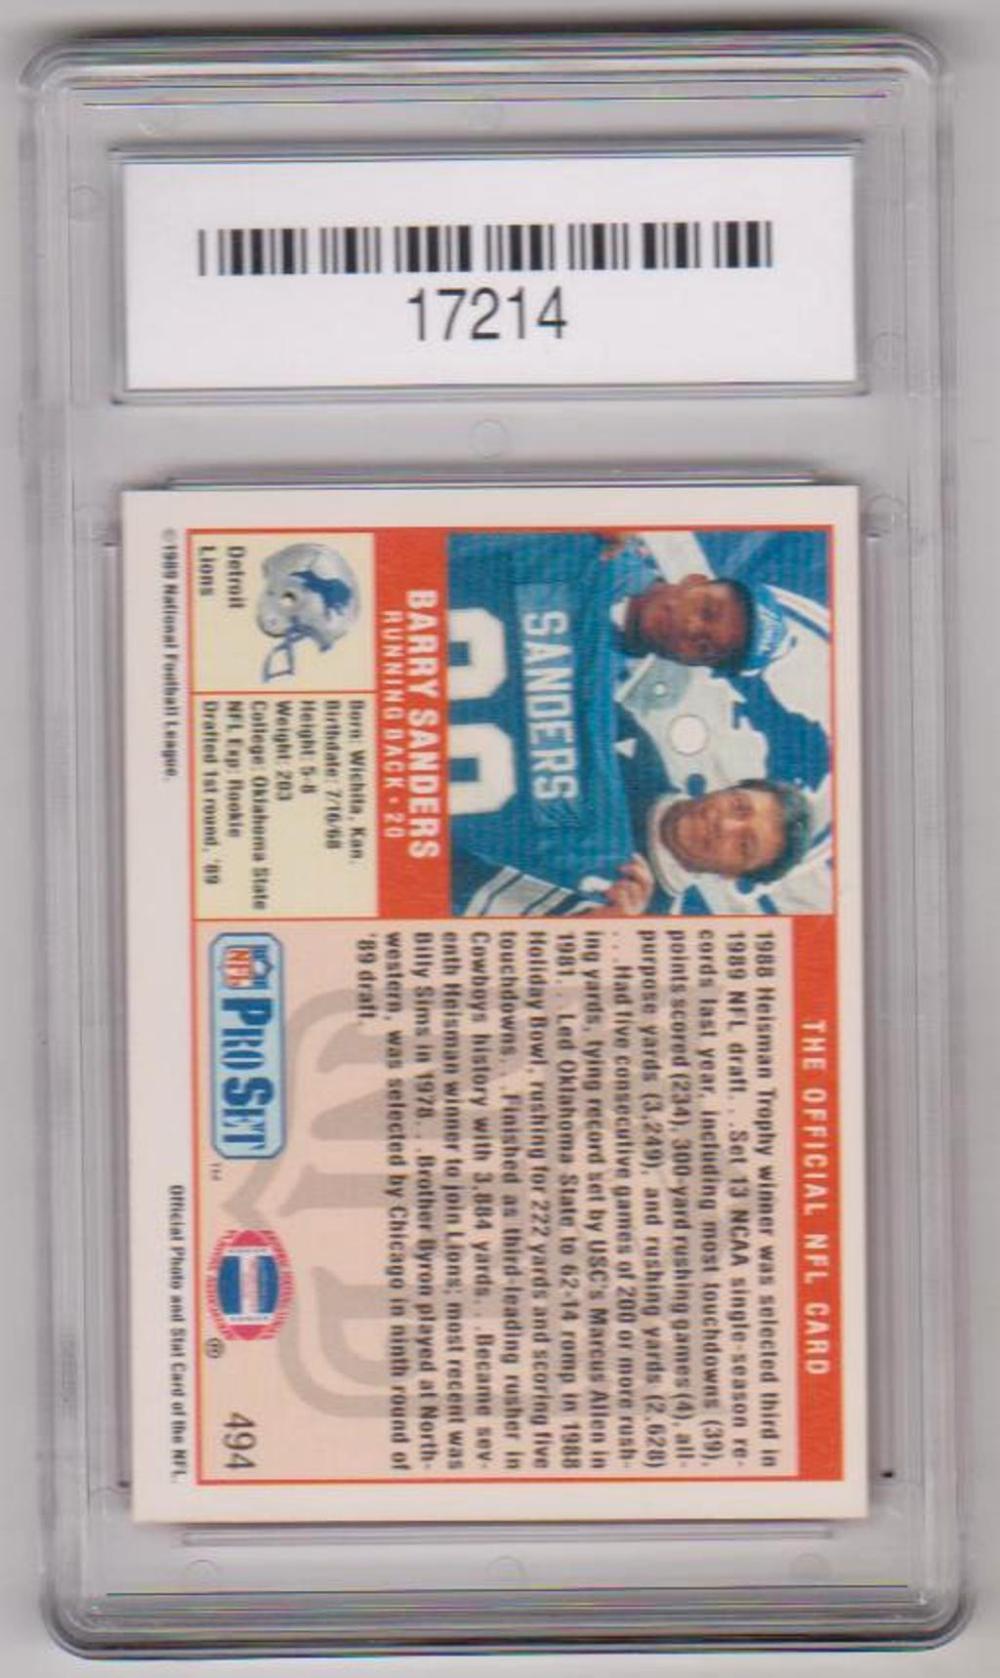 Rookie Graded Gem Mint 10 Barry Sanders 1989 Pro Set 494